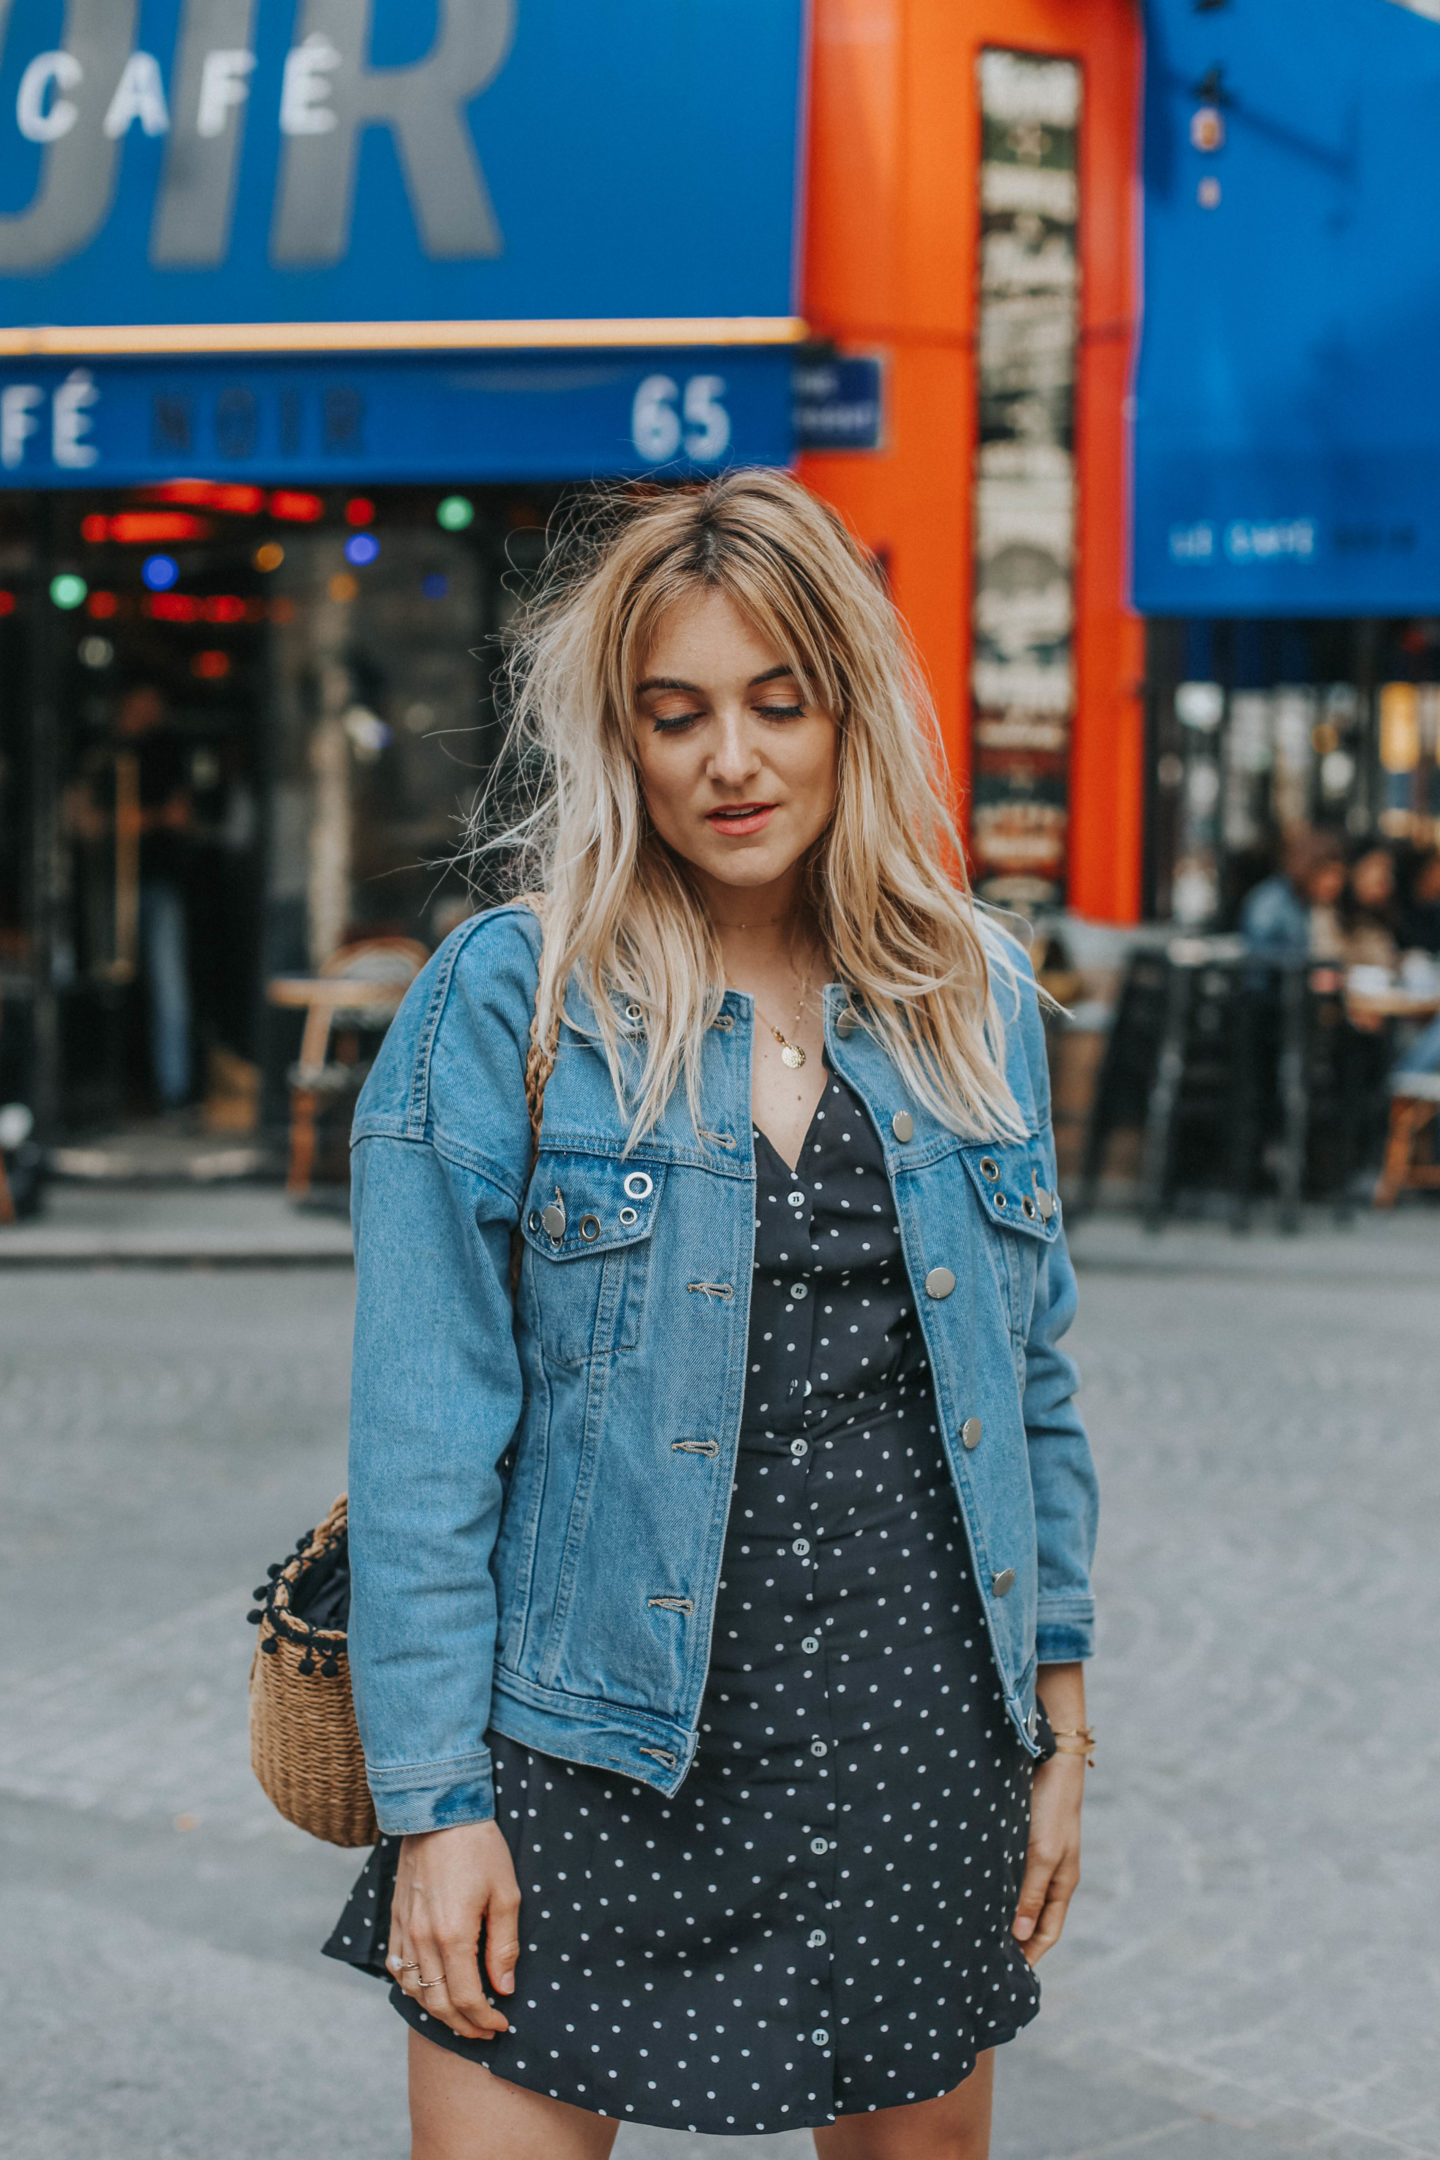 Veste en Jean - Blondie Baby blog mode Paris et voyages